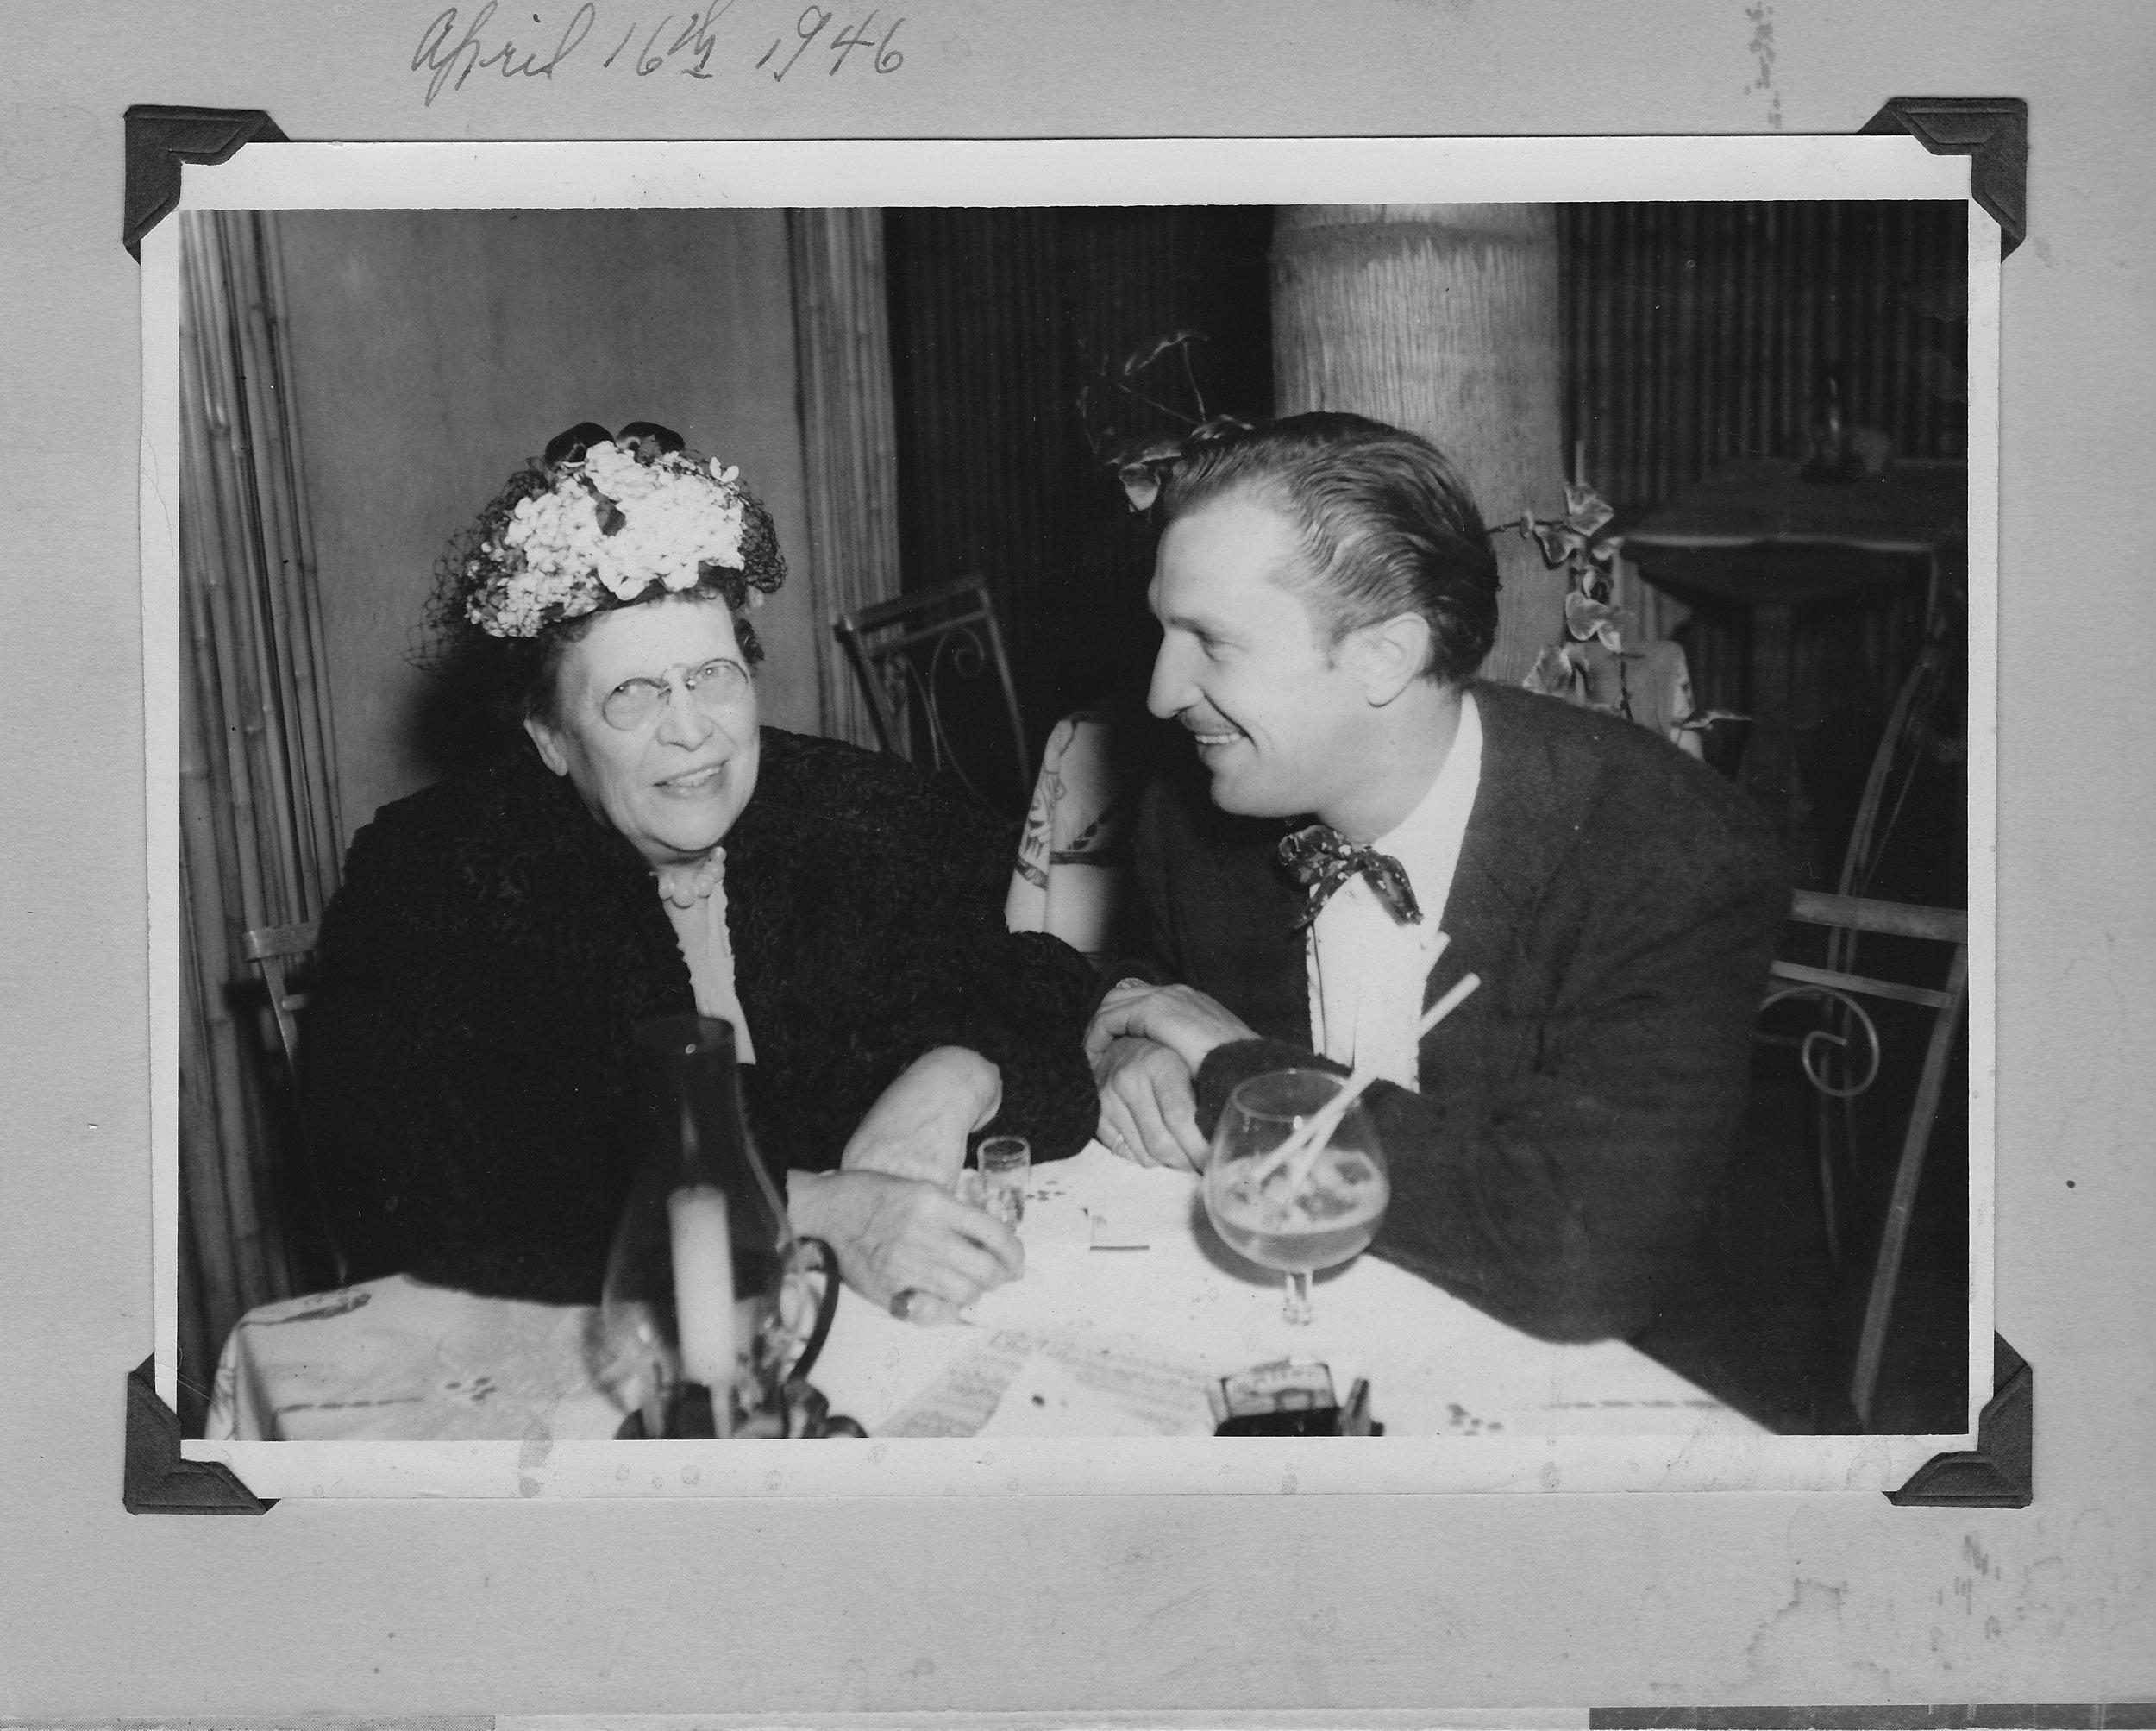 Marguerite Wilcox Price & Vincent Price 1946